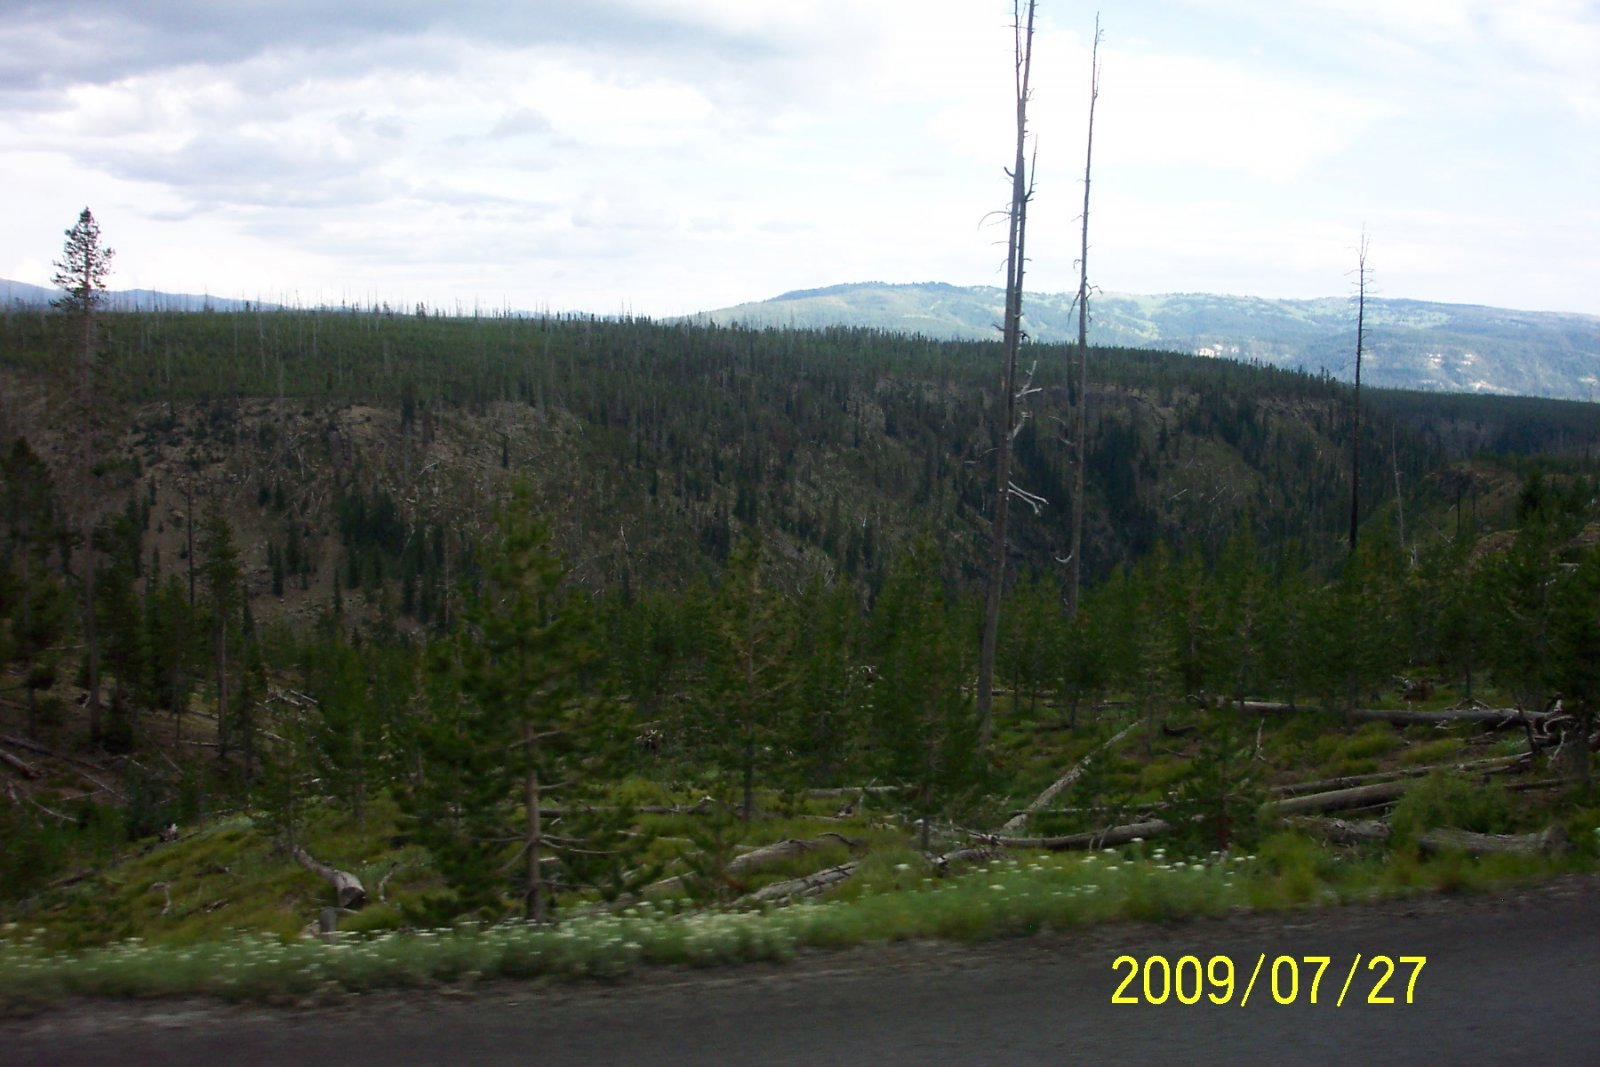 Click image for larger version  Name:jackson to nebraska 002.jpg Views:119 Size:220.0 KB ID:85315